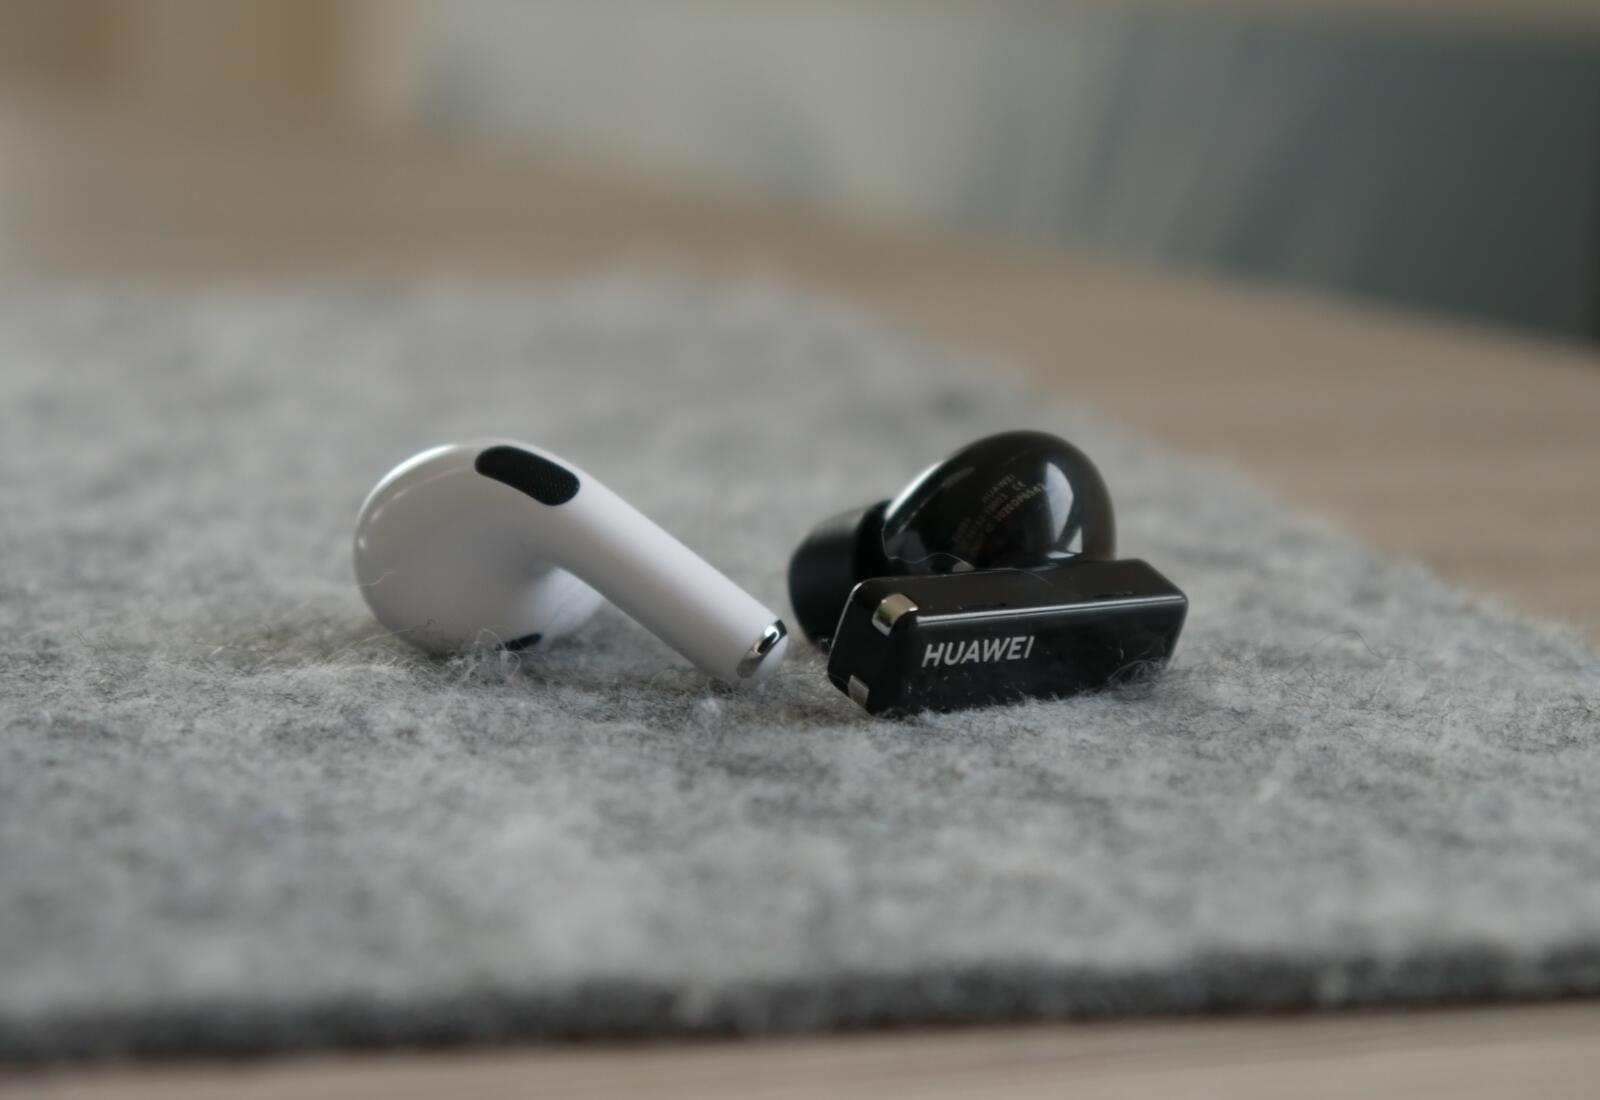 Huawei Freebuds Pro Airpods Pro